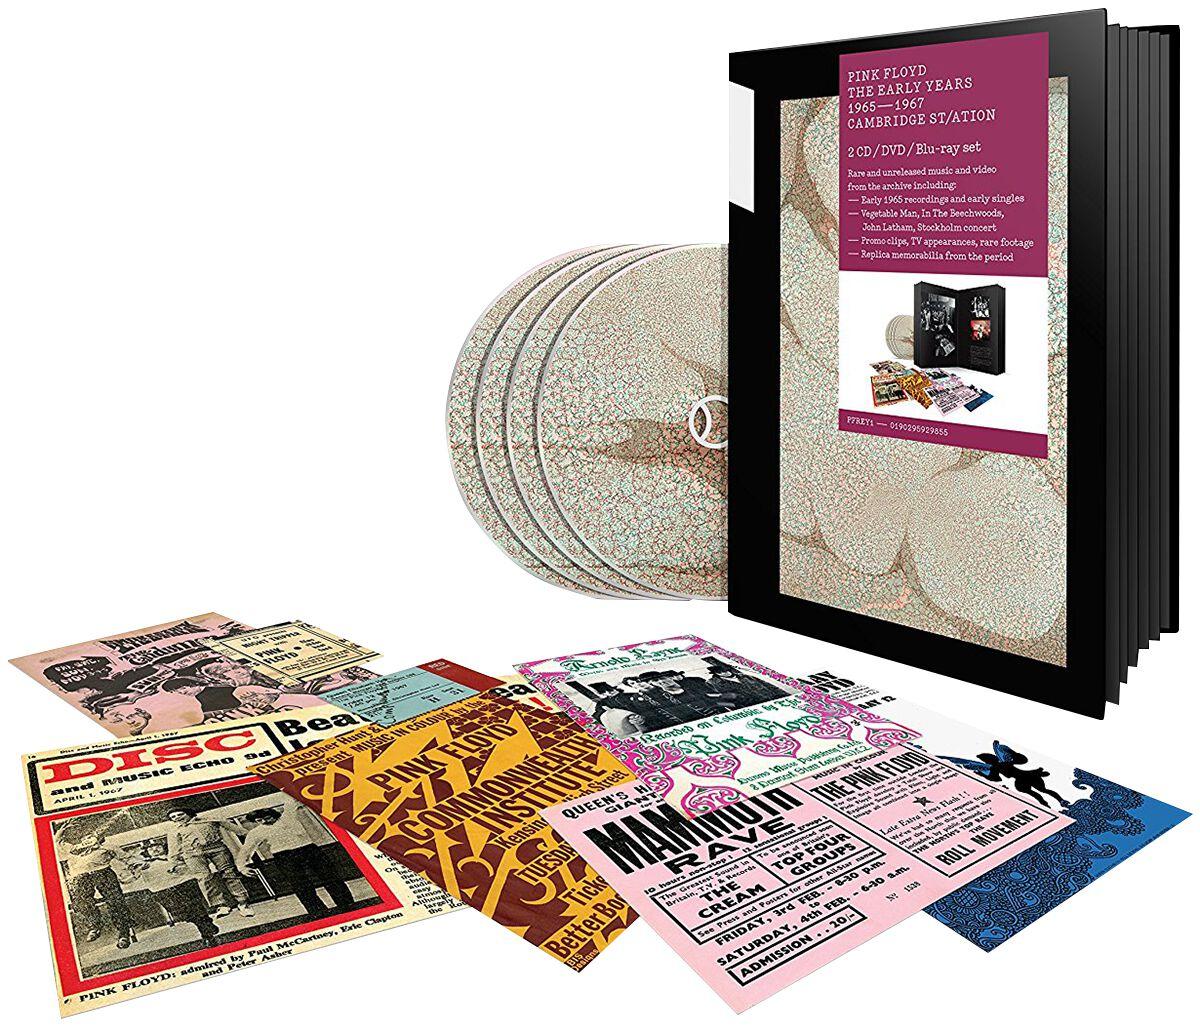 Image of   Pink Floyd 1965 - 1967 Cambridge ST/Ation 2-CD & DVD & Blu-ray standard